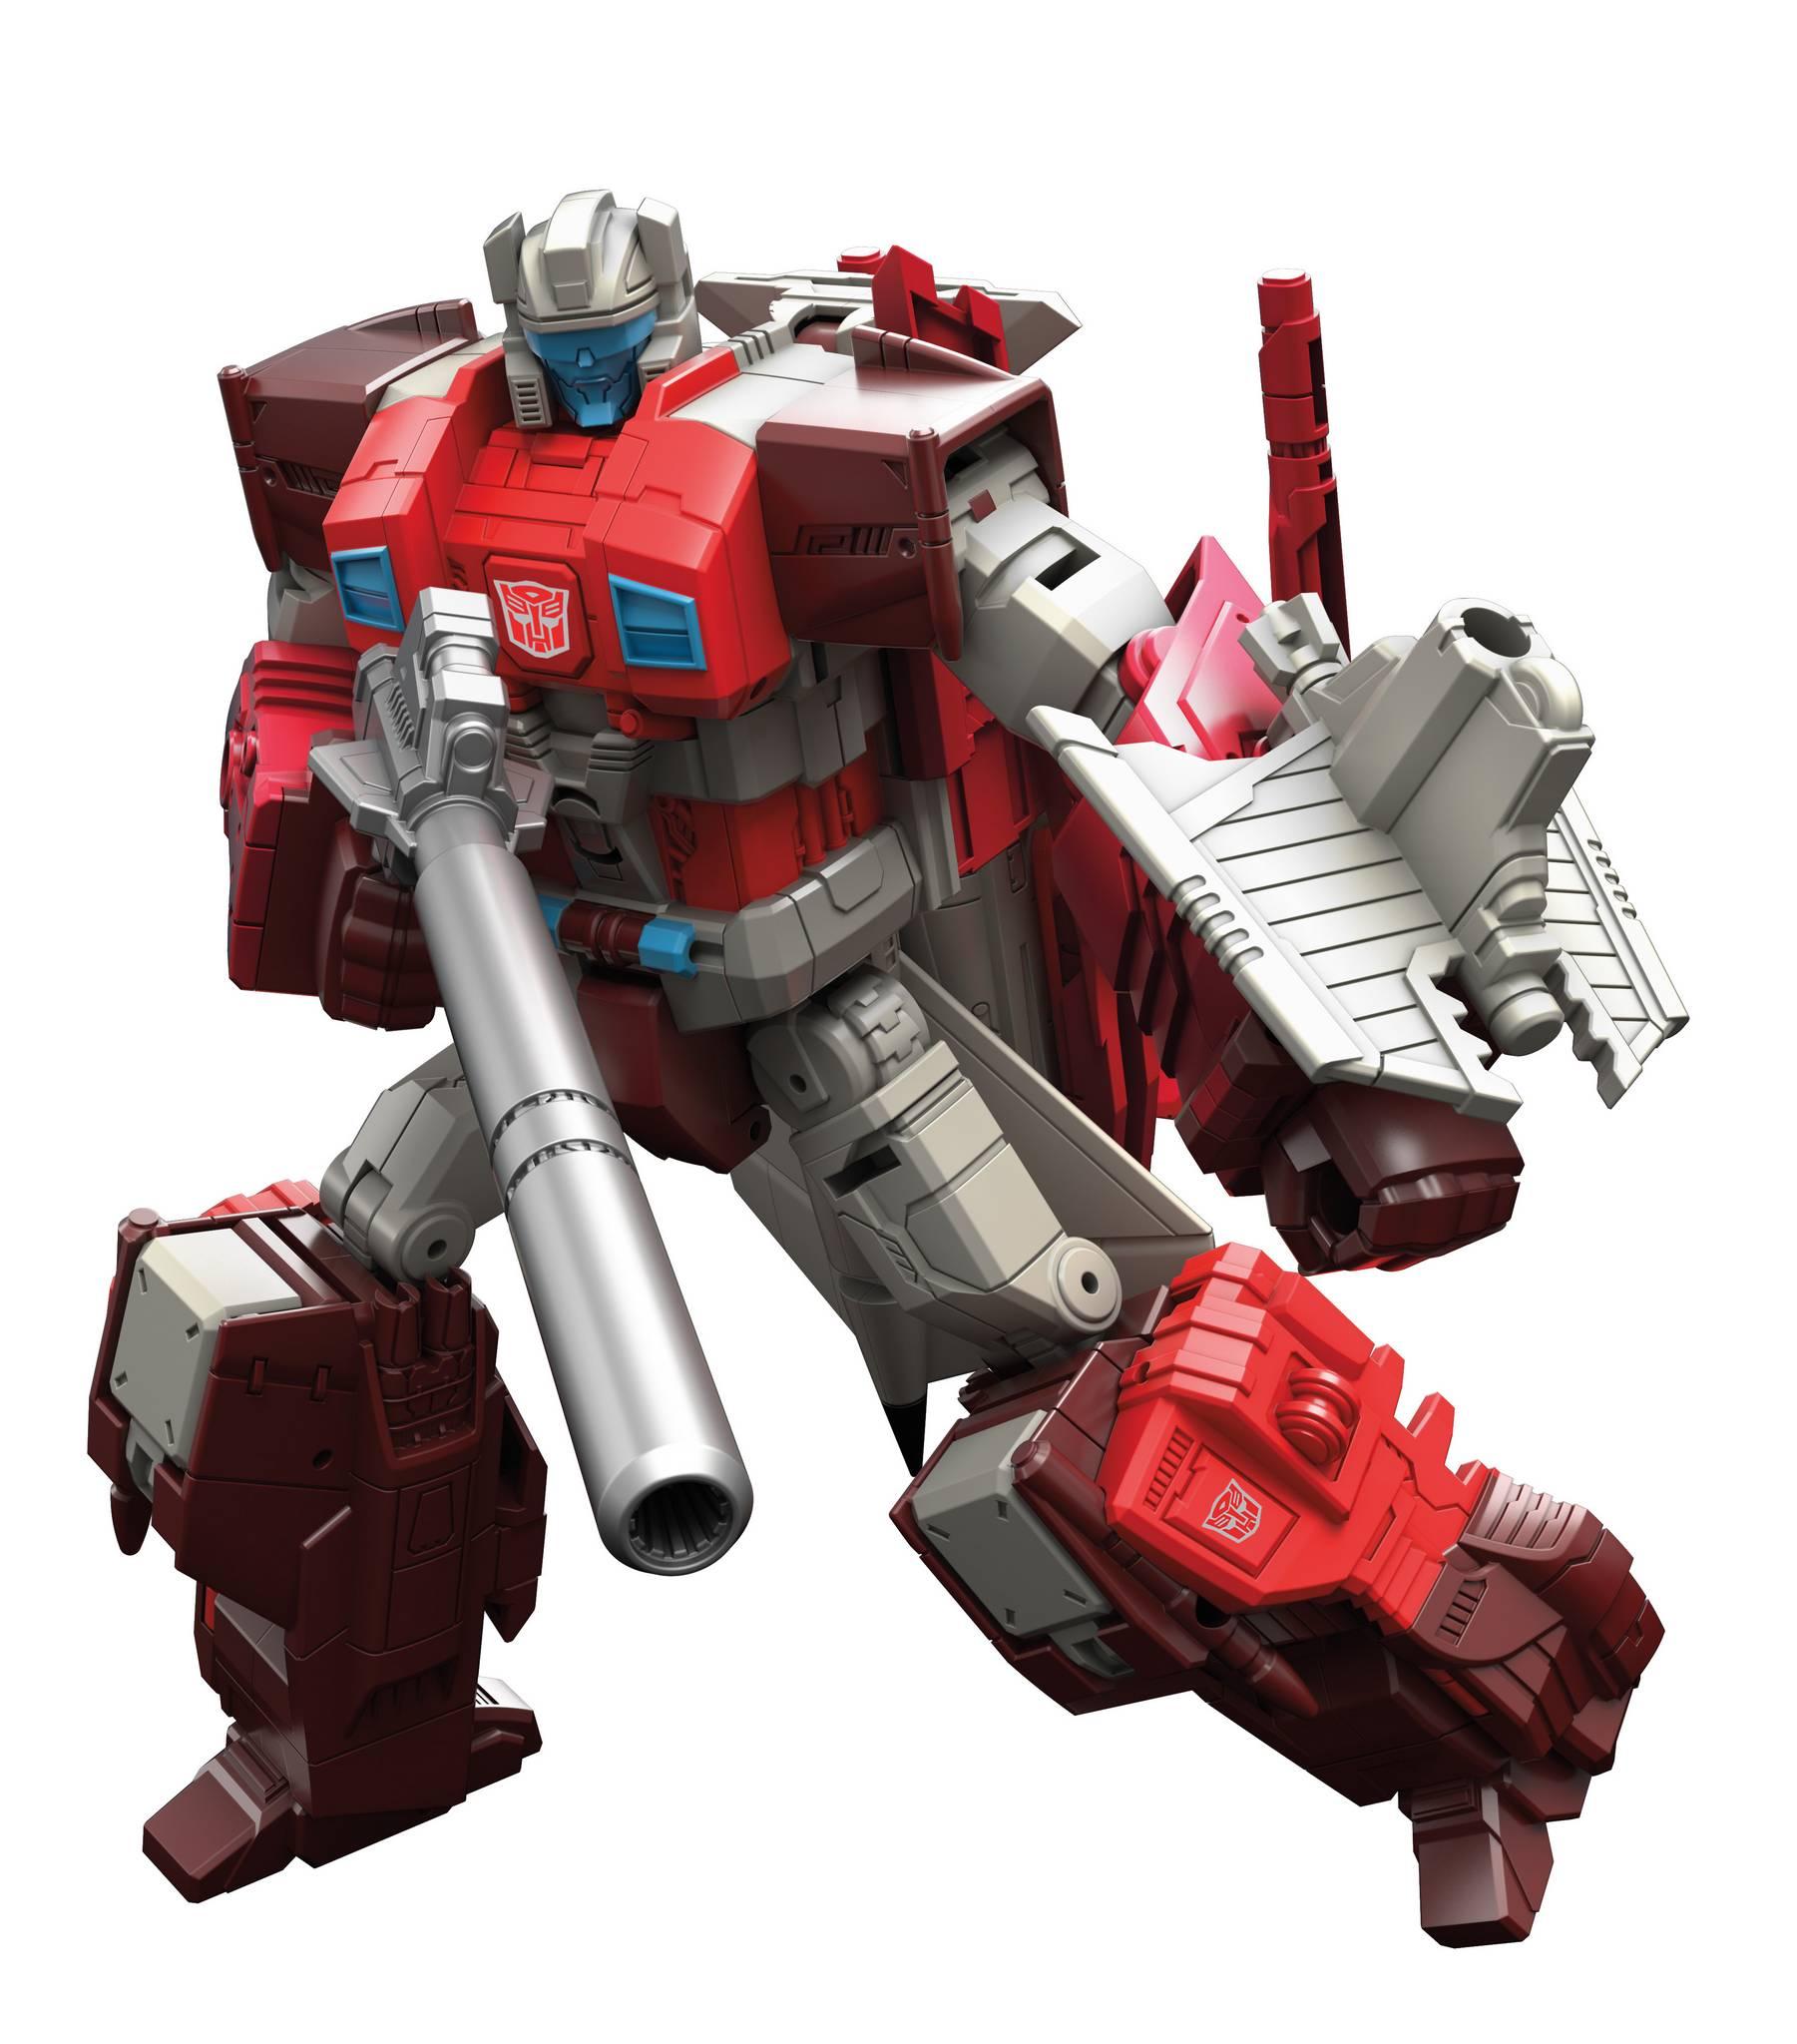 Combiner Wars Scattershot - Official Images - Transformers